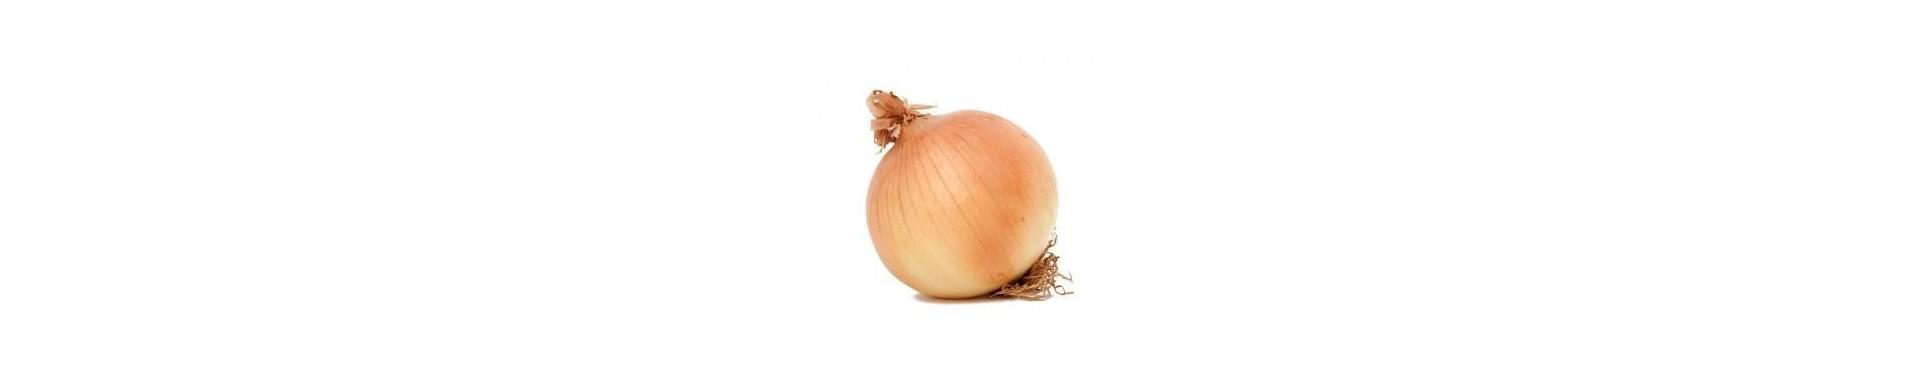 Plant onions - Buy onion plants